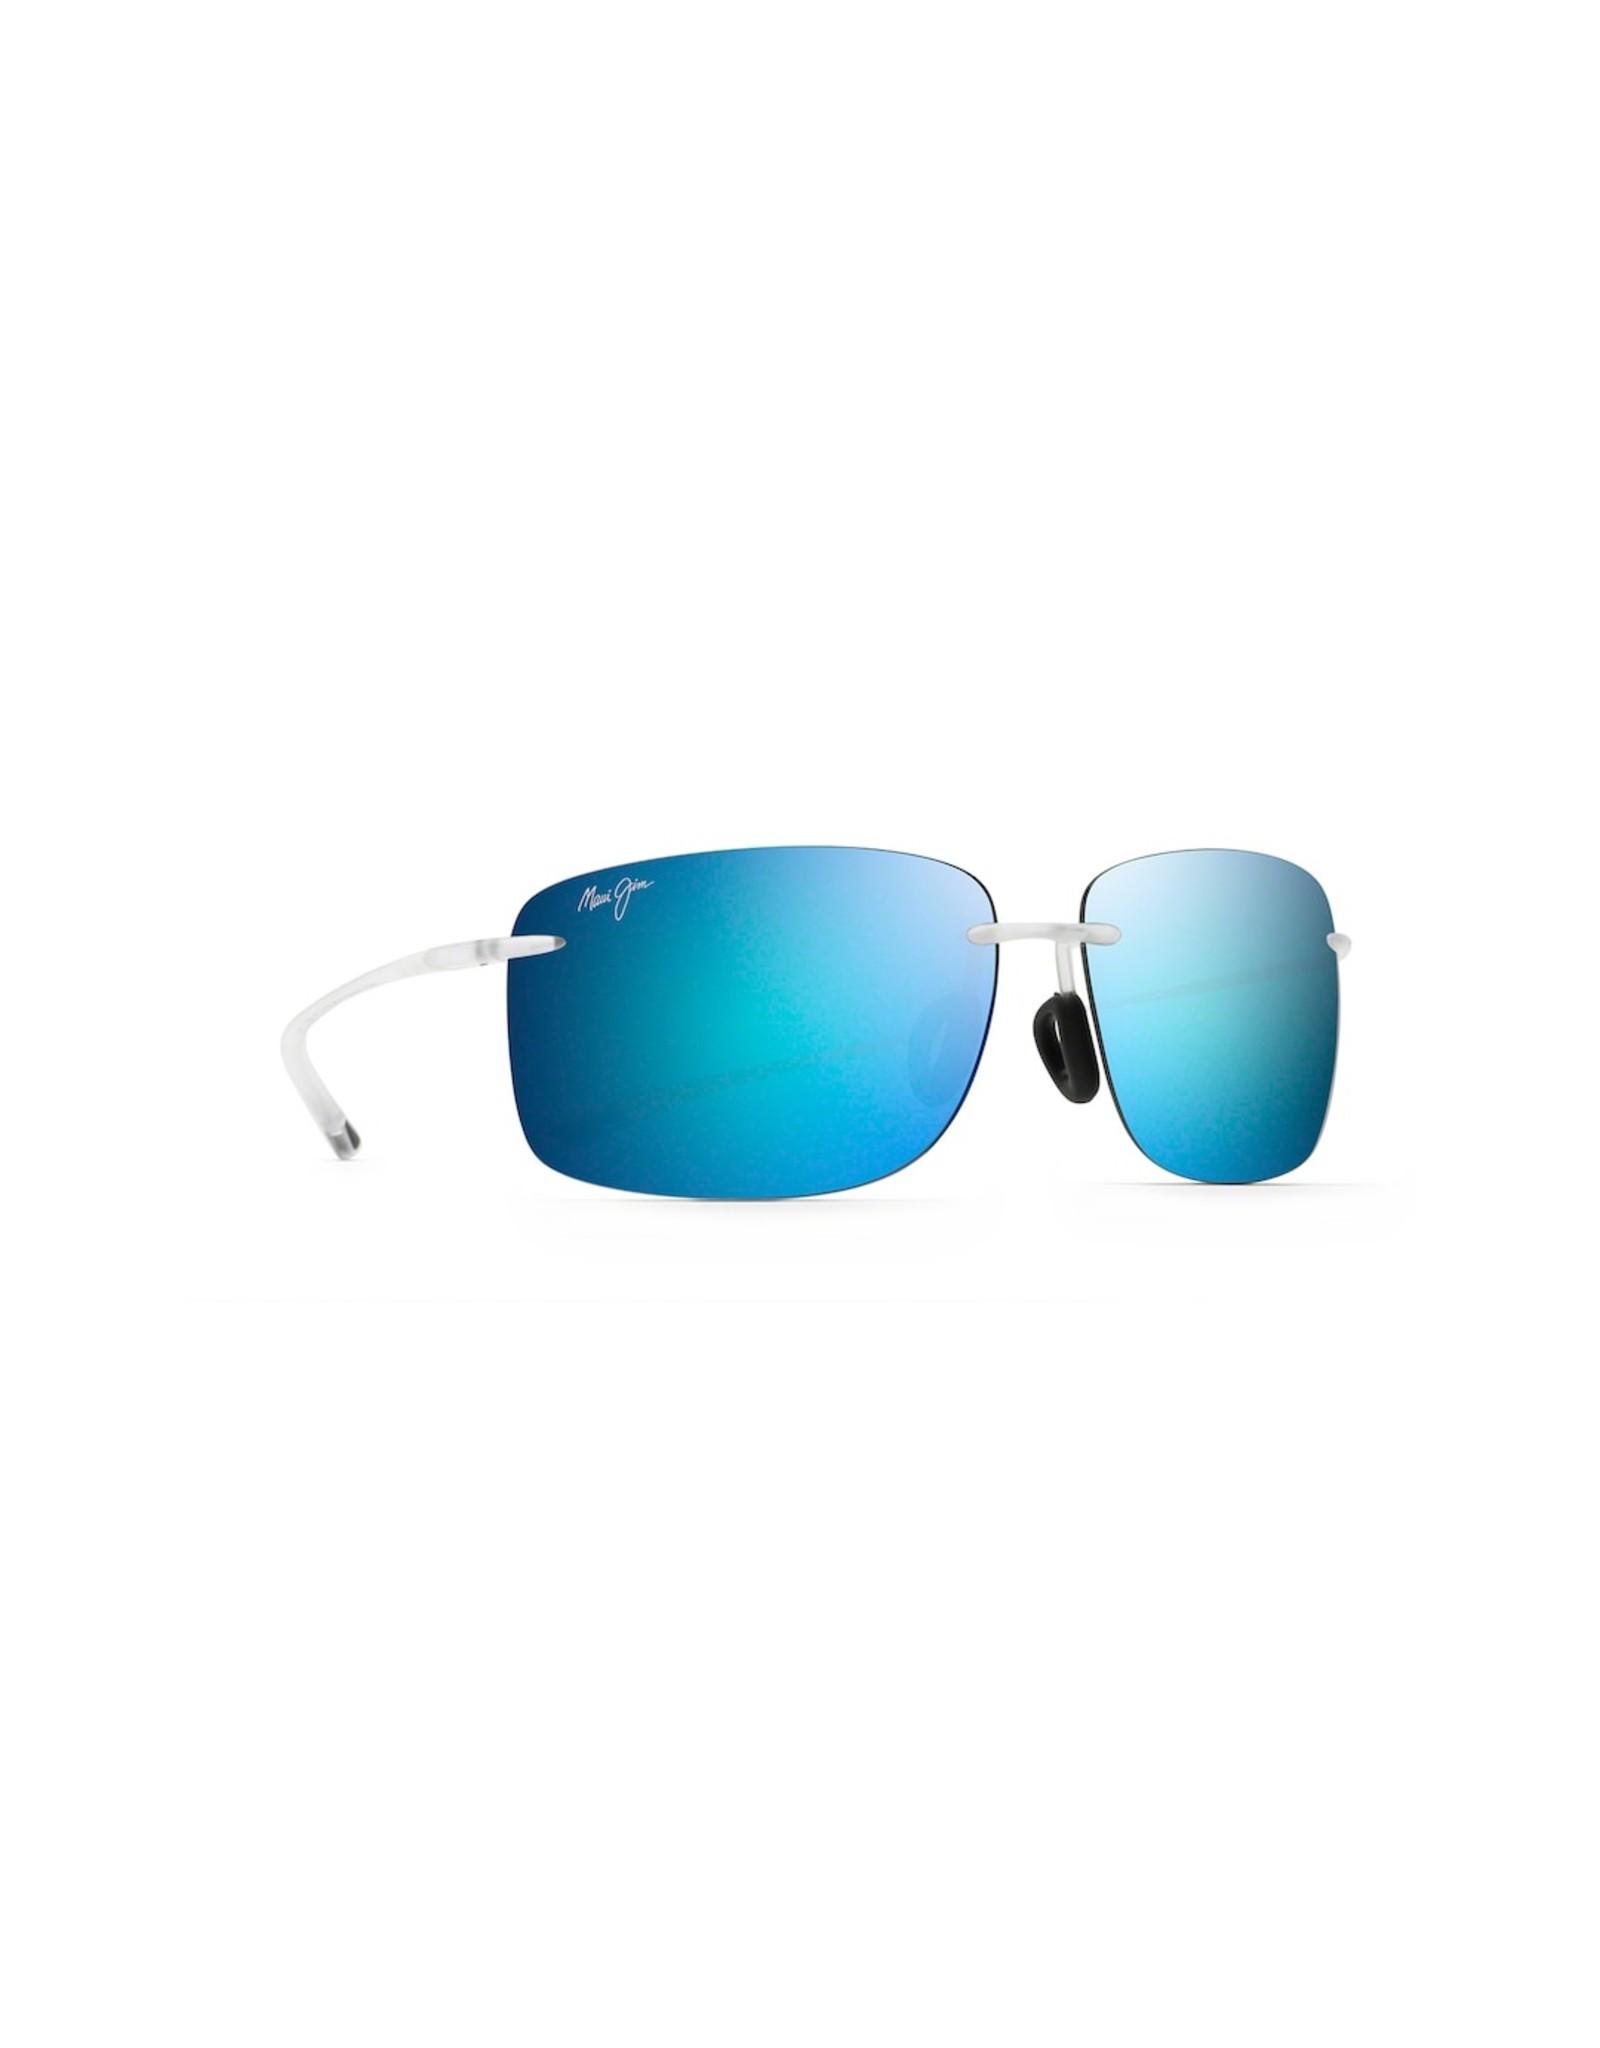 Maui Jim Maui Jim ' Hema' Sunglasses